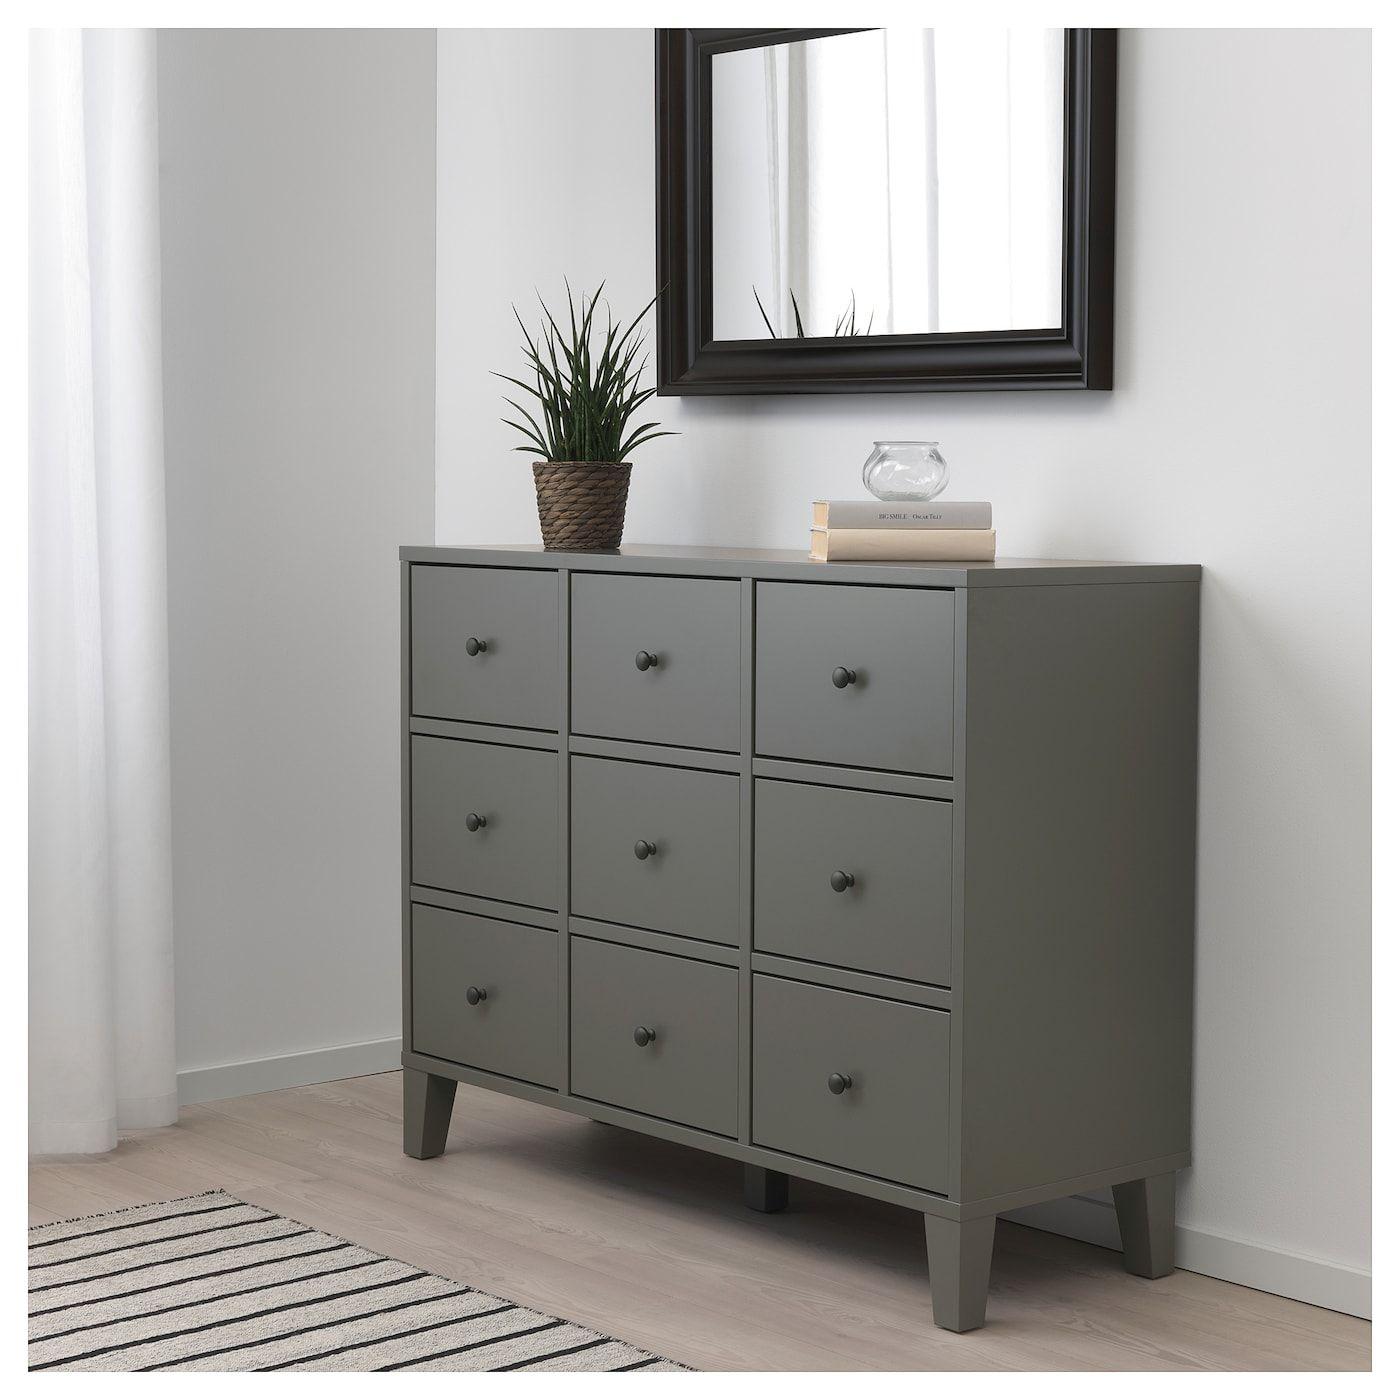 Bryggja 9 Drawer Chest Dark Gray 46 1 2x36 1 4 Bedroom Chest